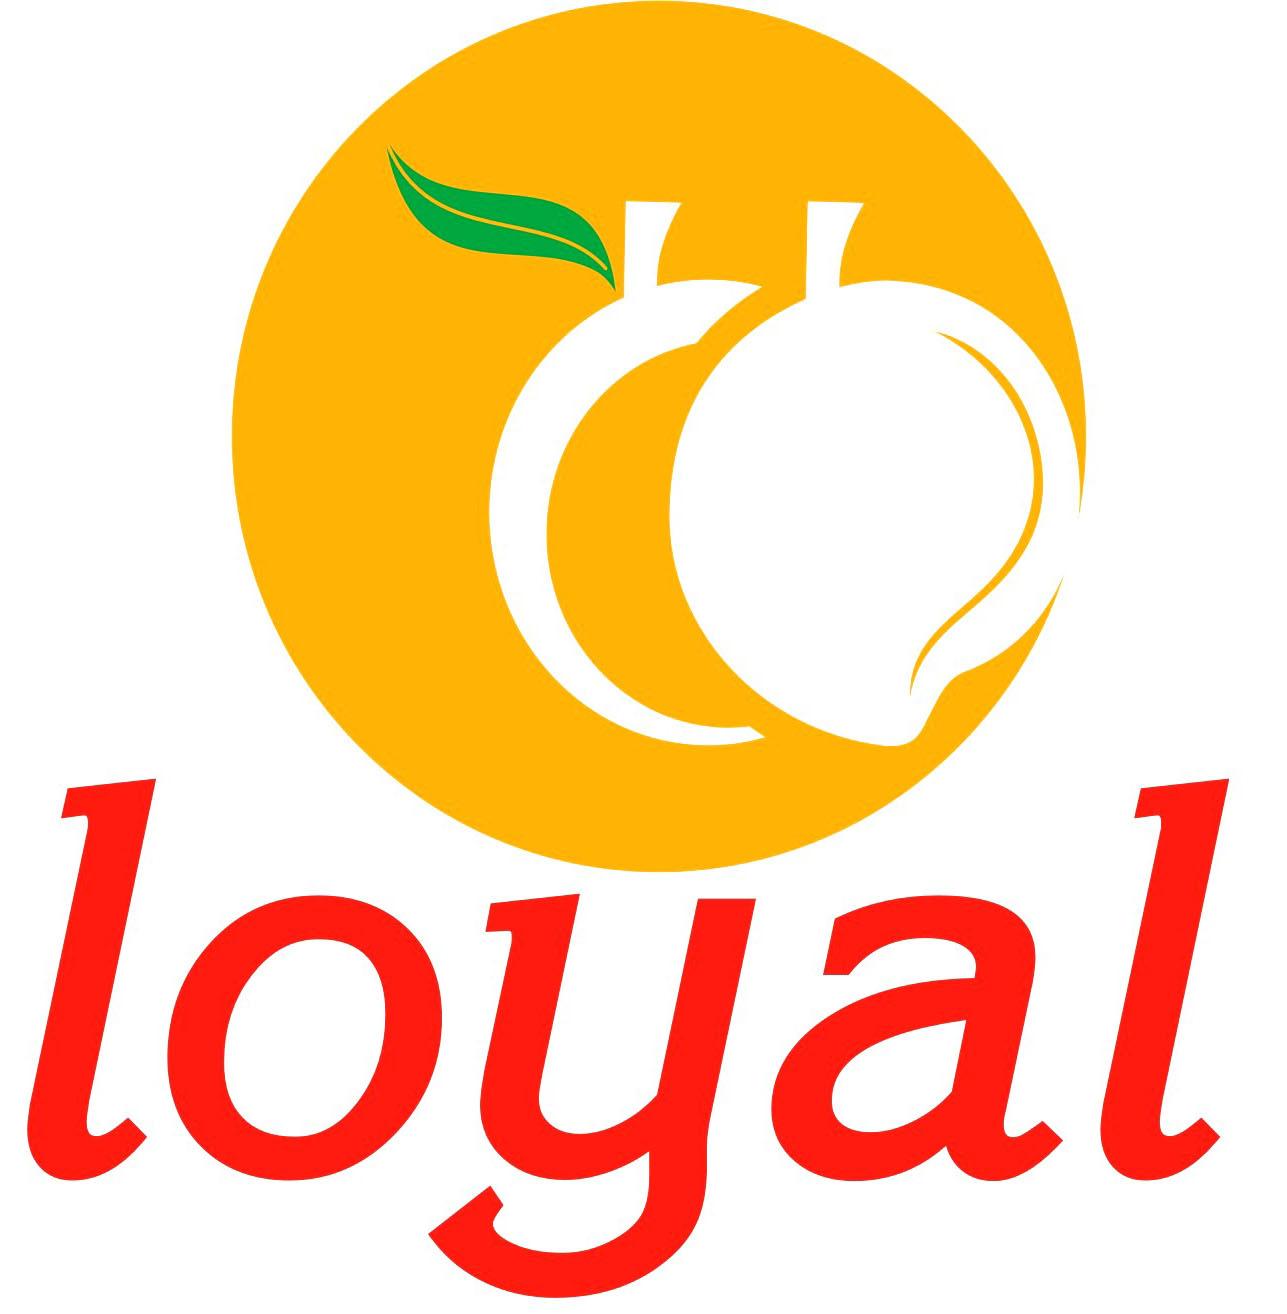 Loyal Food International